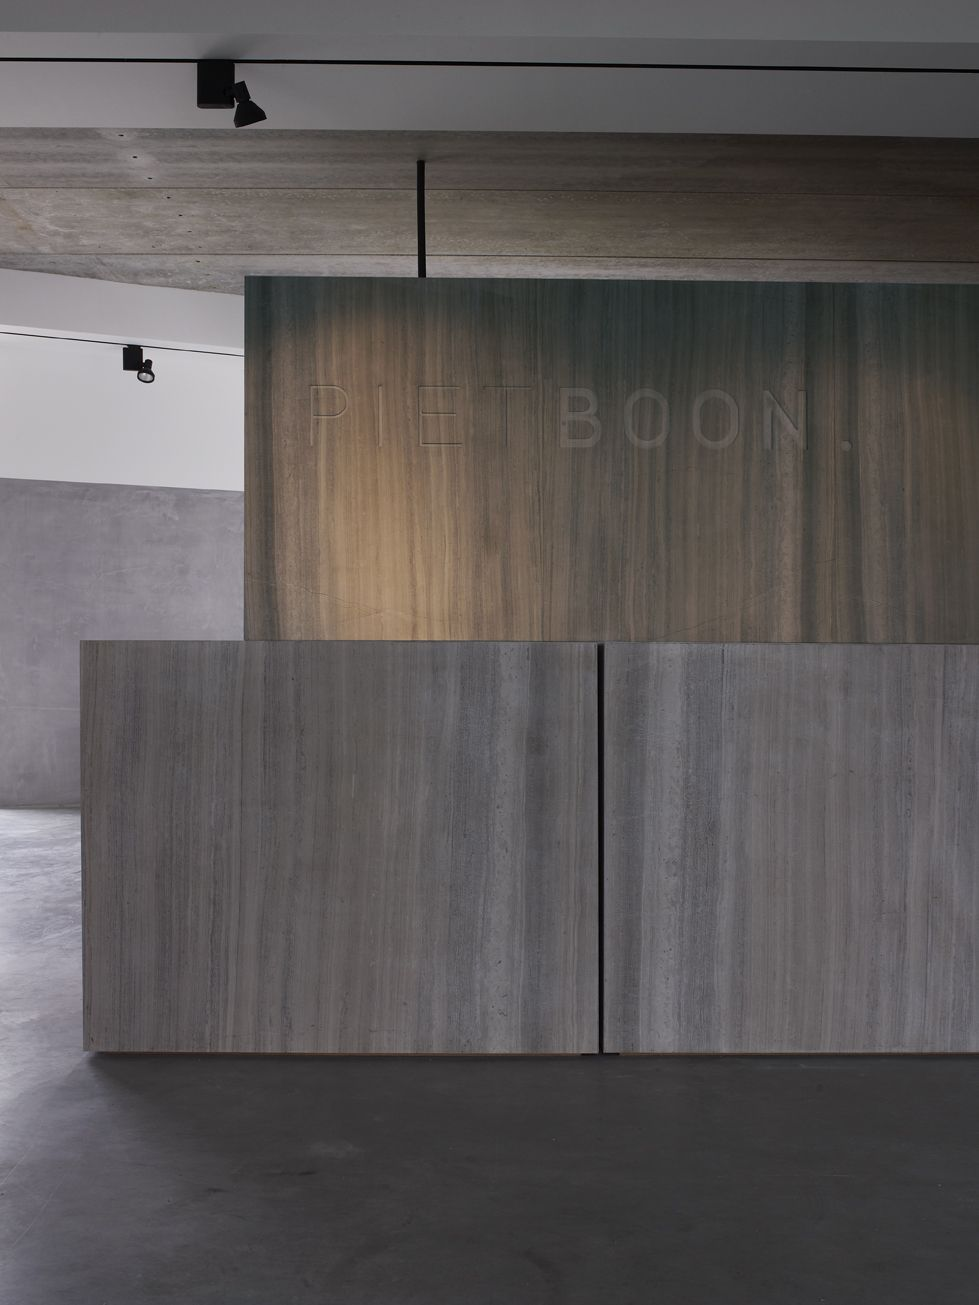 Reception area studio piet boon amsterdam interior for Industrial design amsterdam